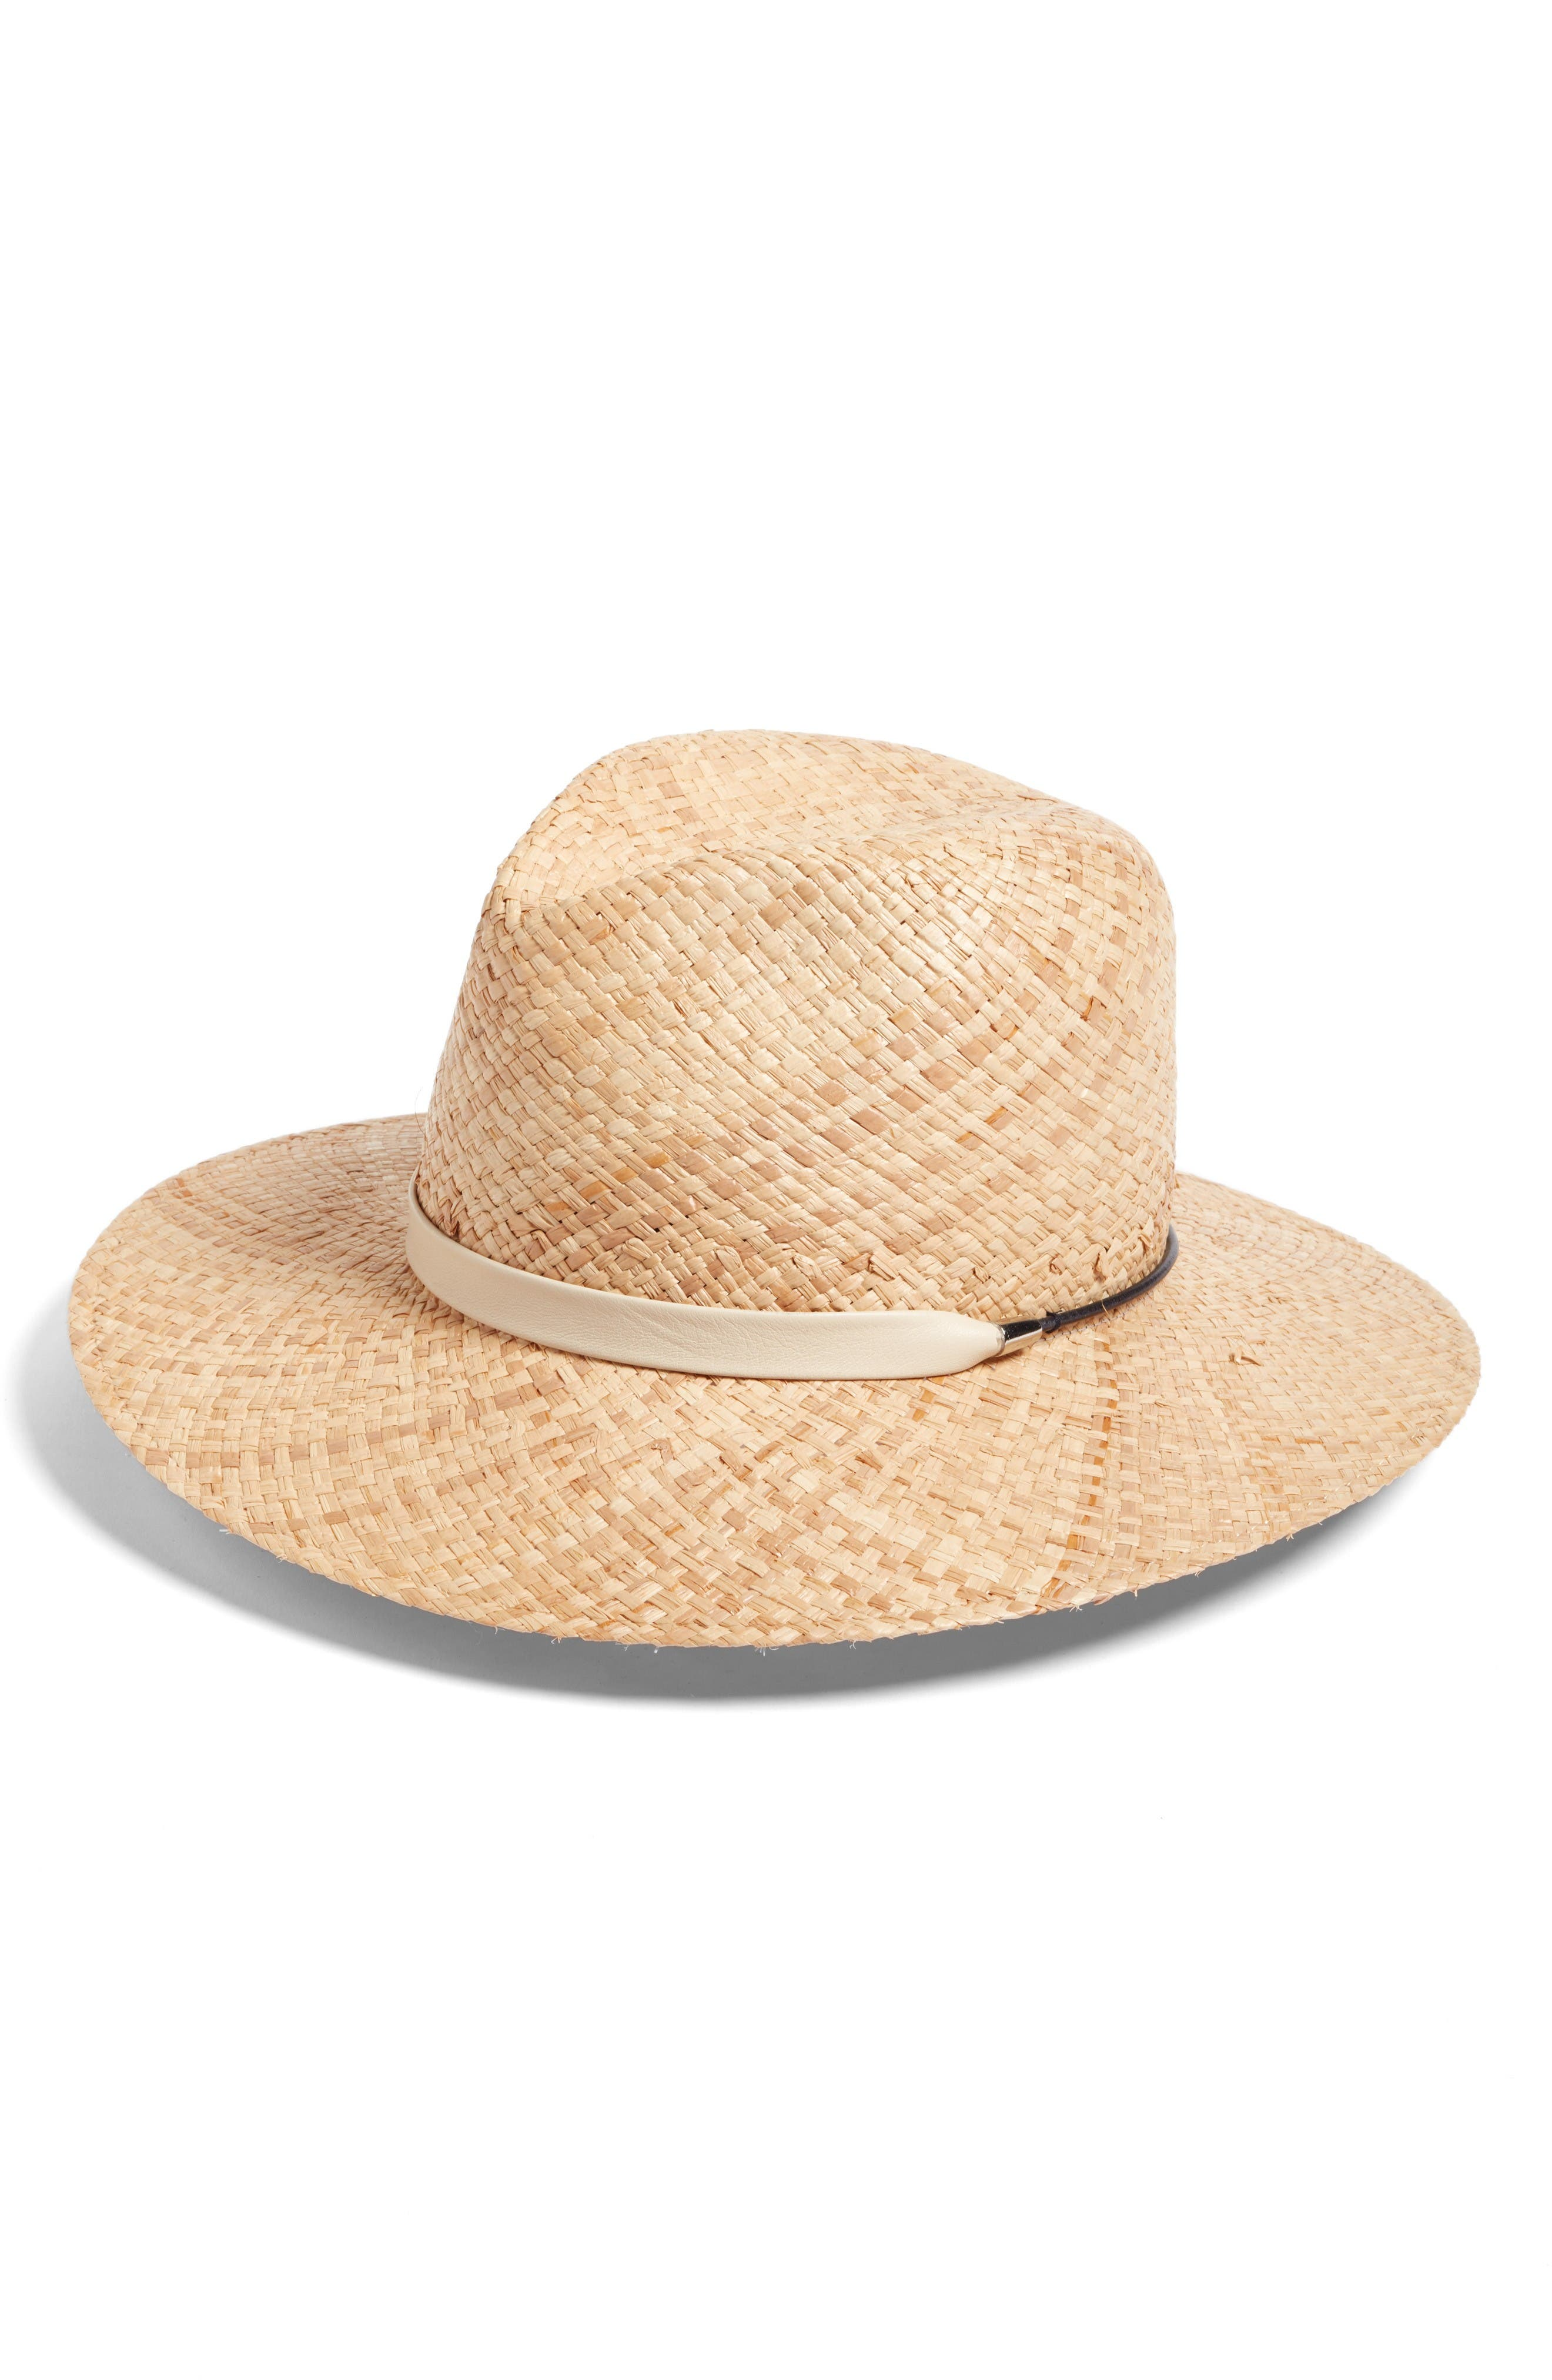 Main Image - rag & bone Wide Brim Raffia Hat